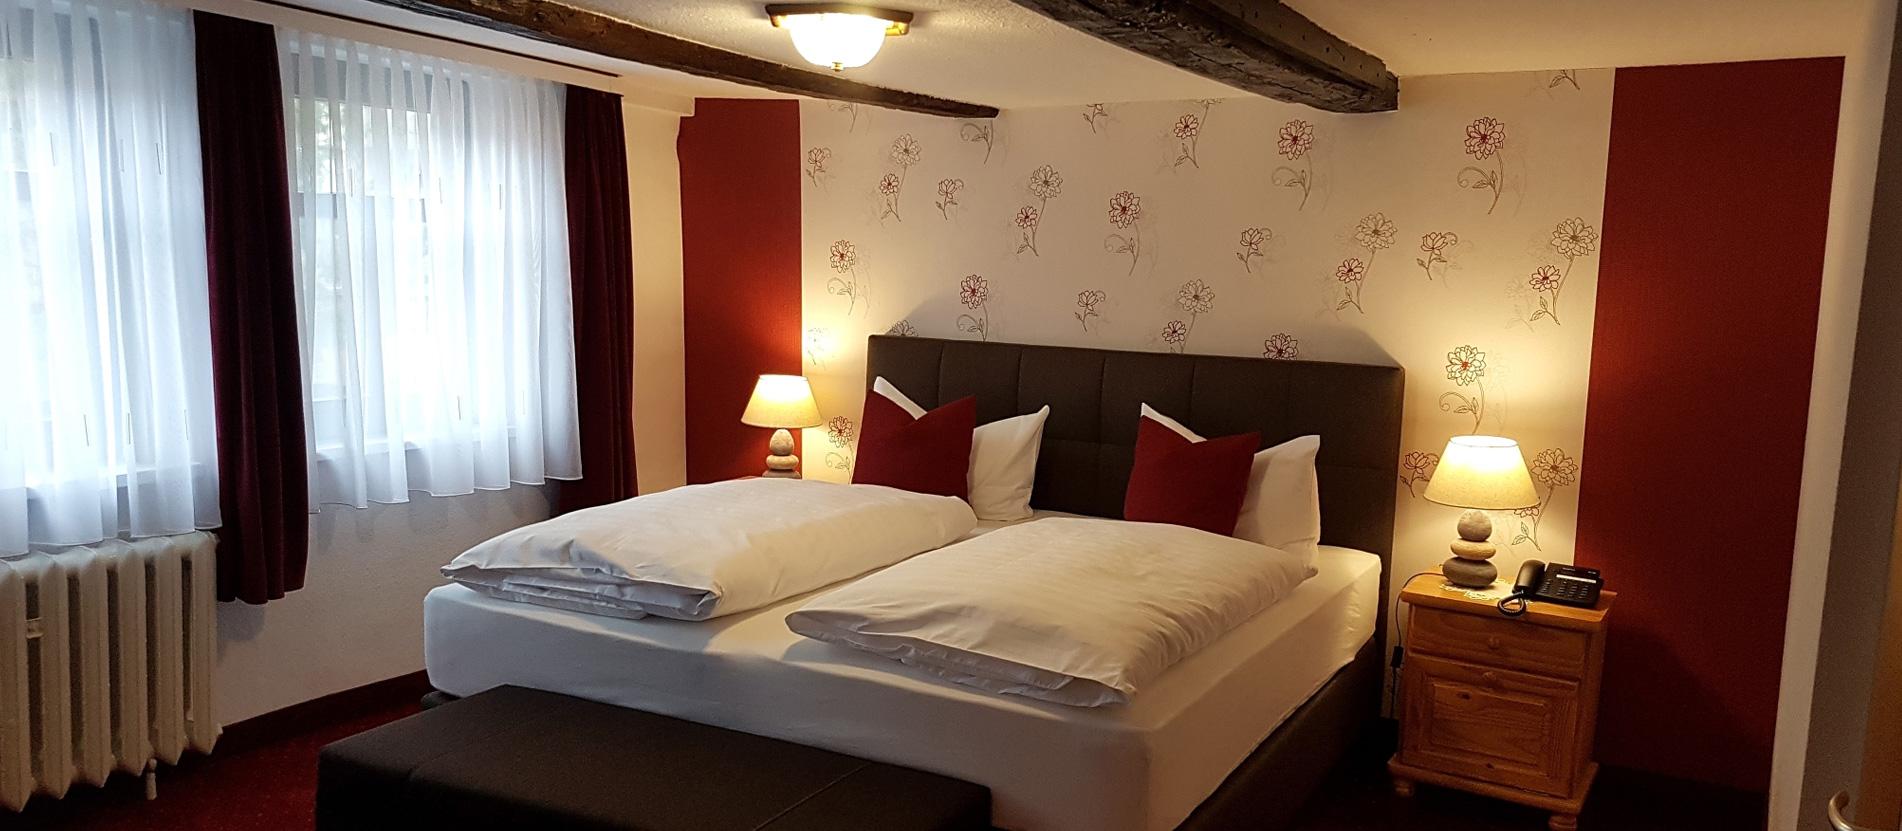 Hotel Zum Bürgergarten Zimmer